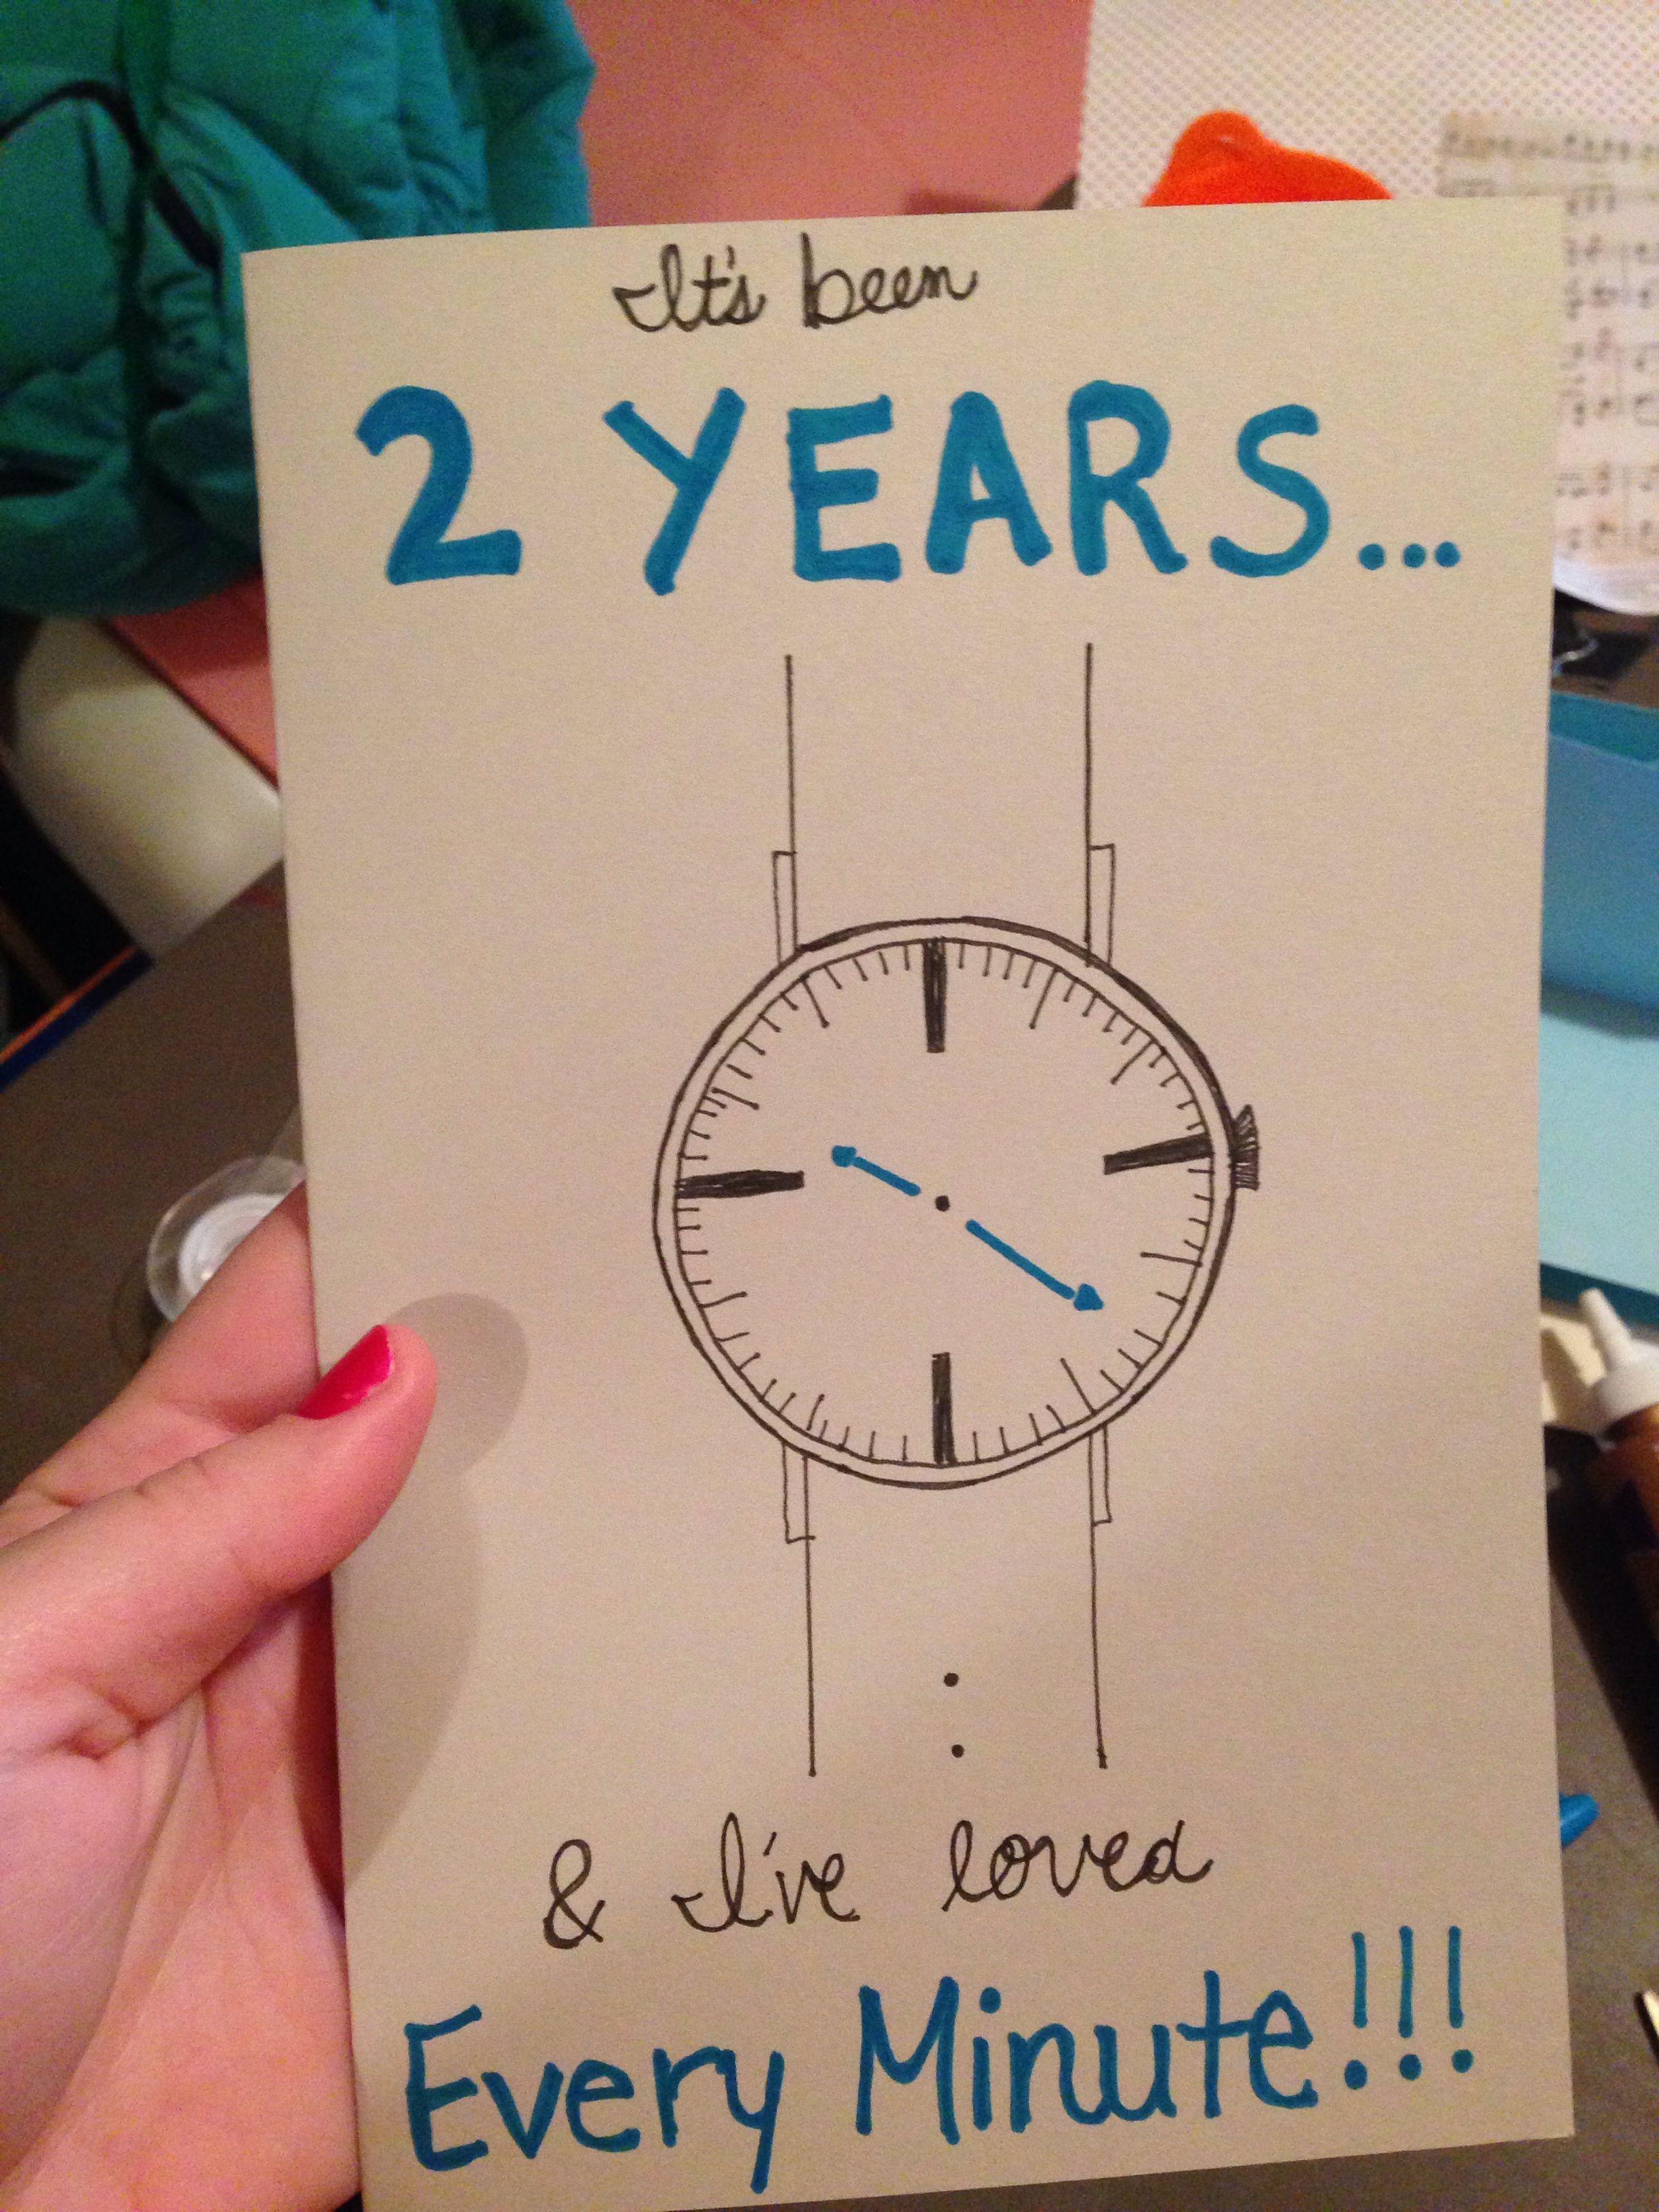 Cute 2 Year Wedding Anniversary Ideas For Him : anniversary ideas for him 2 year anniversary present boyfriend cute ...